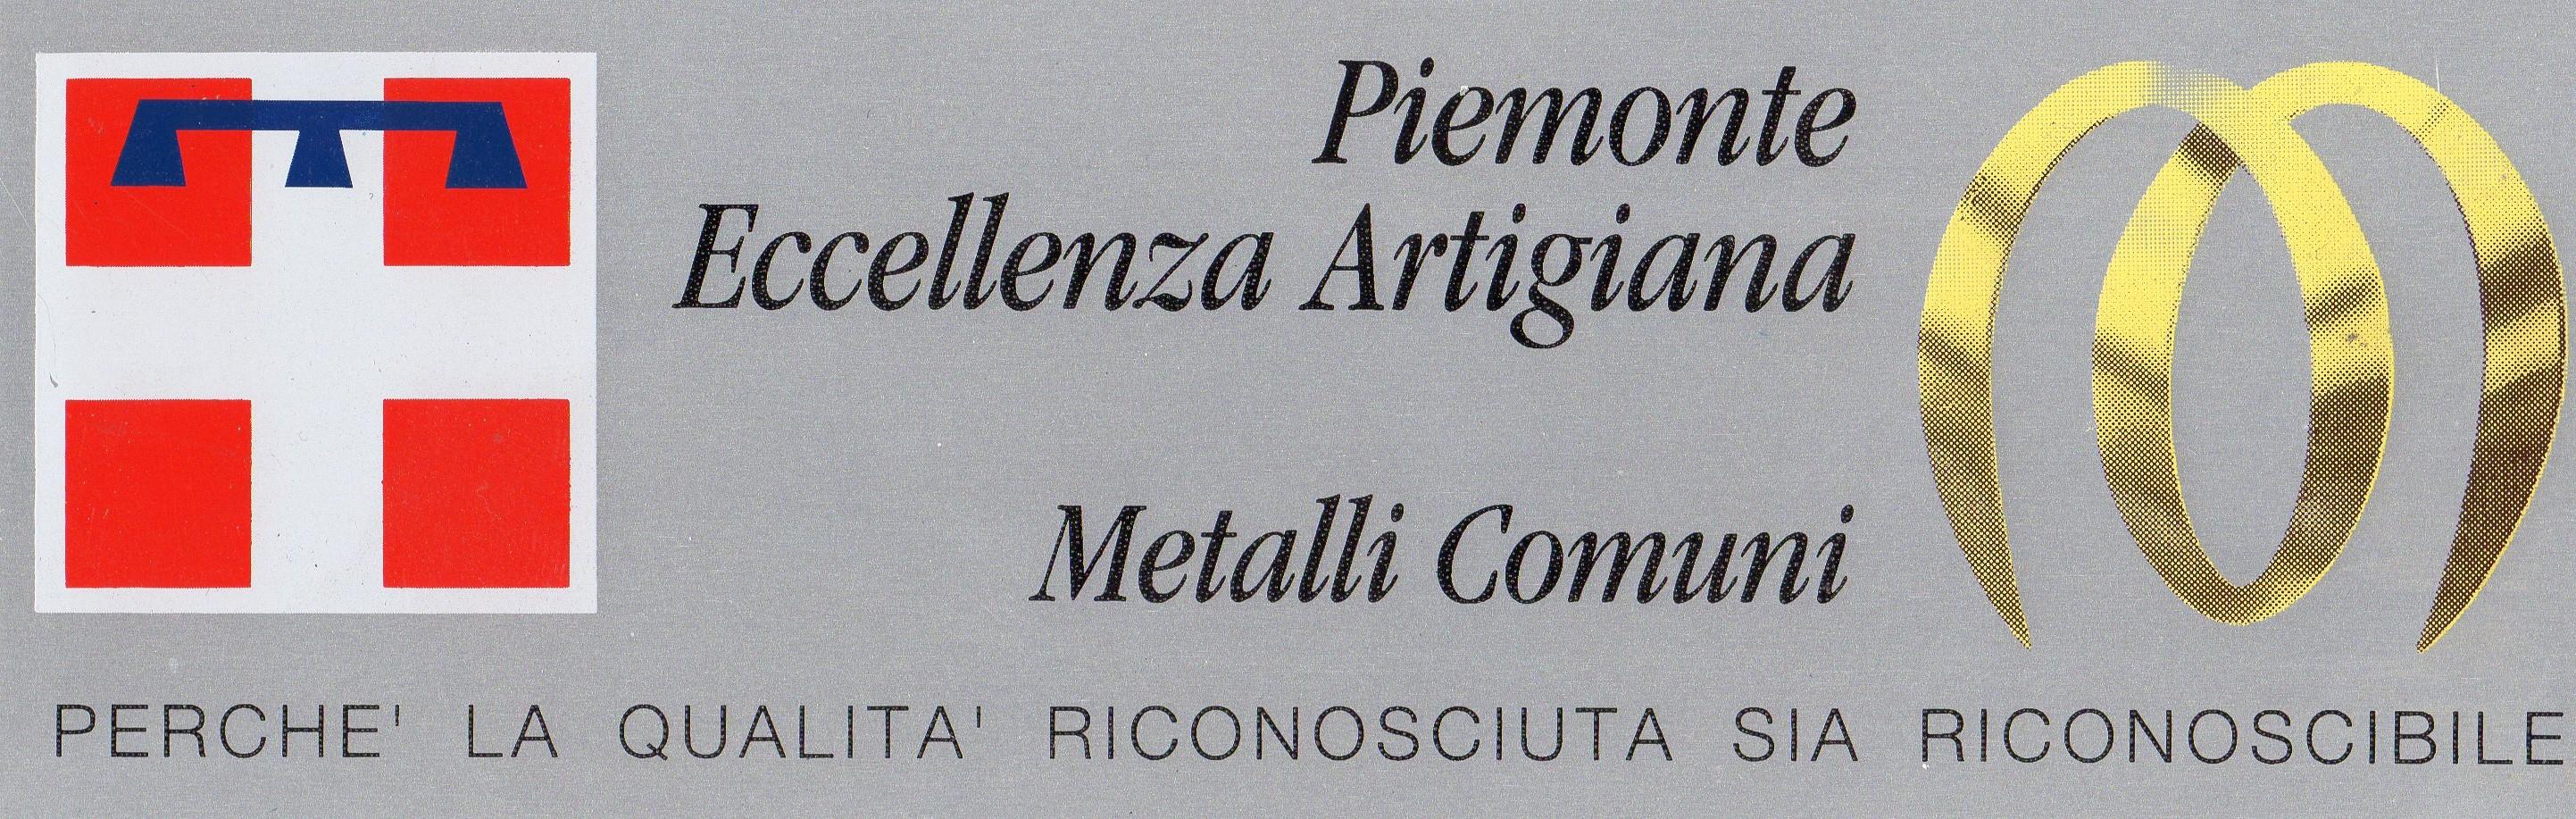 FAVV Iron Luxury Eccellenza Artigiana Piemontese